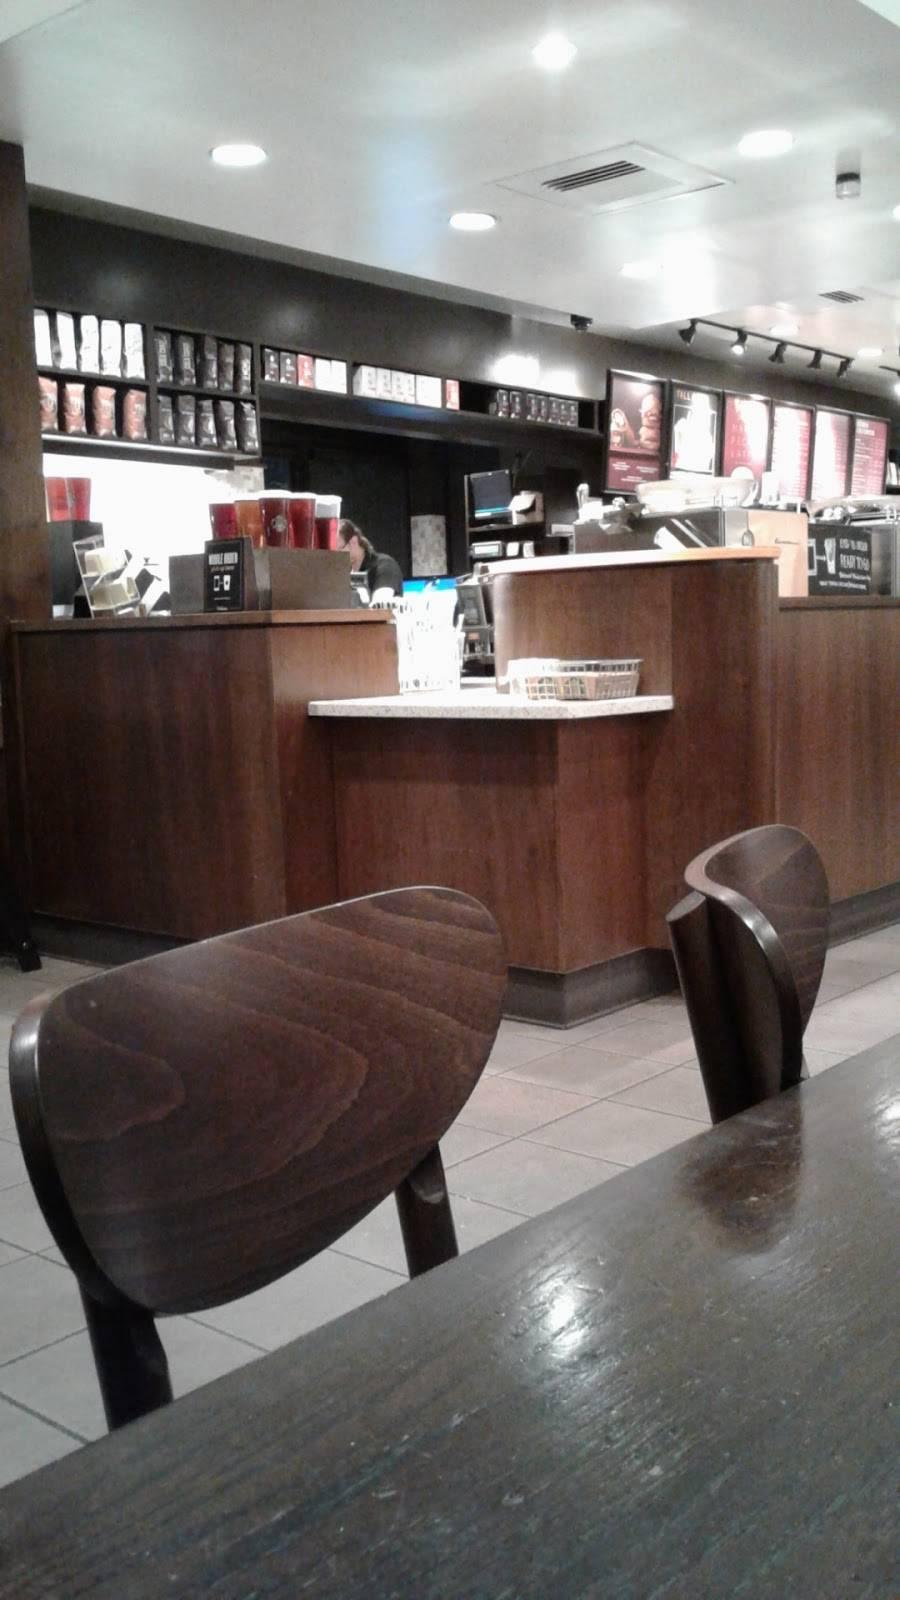 Starbucks - cafe    Photo 7 of 10   Address: 5731 S Hulen St, Fort Worth, TX 76132, USA   Phone: (817) 346-2715